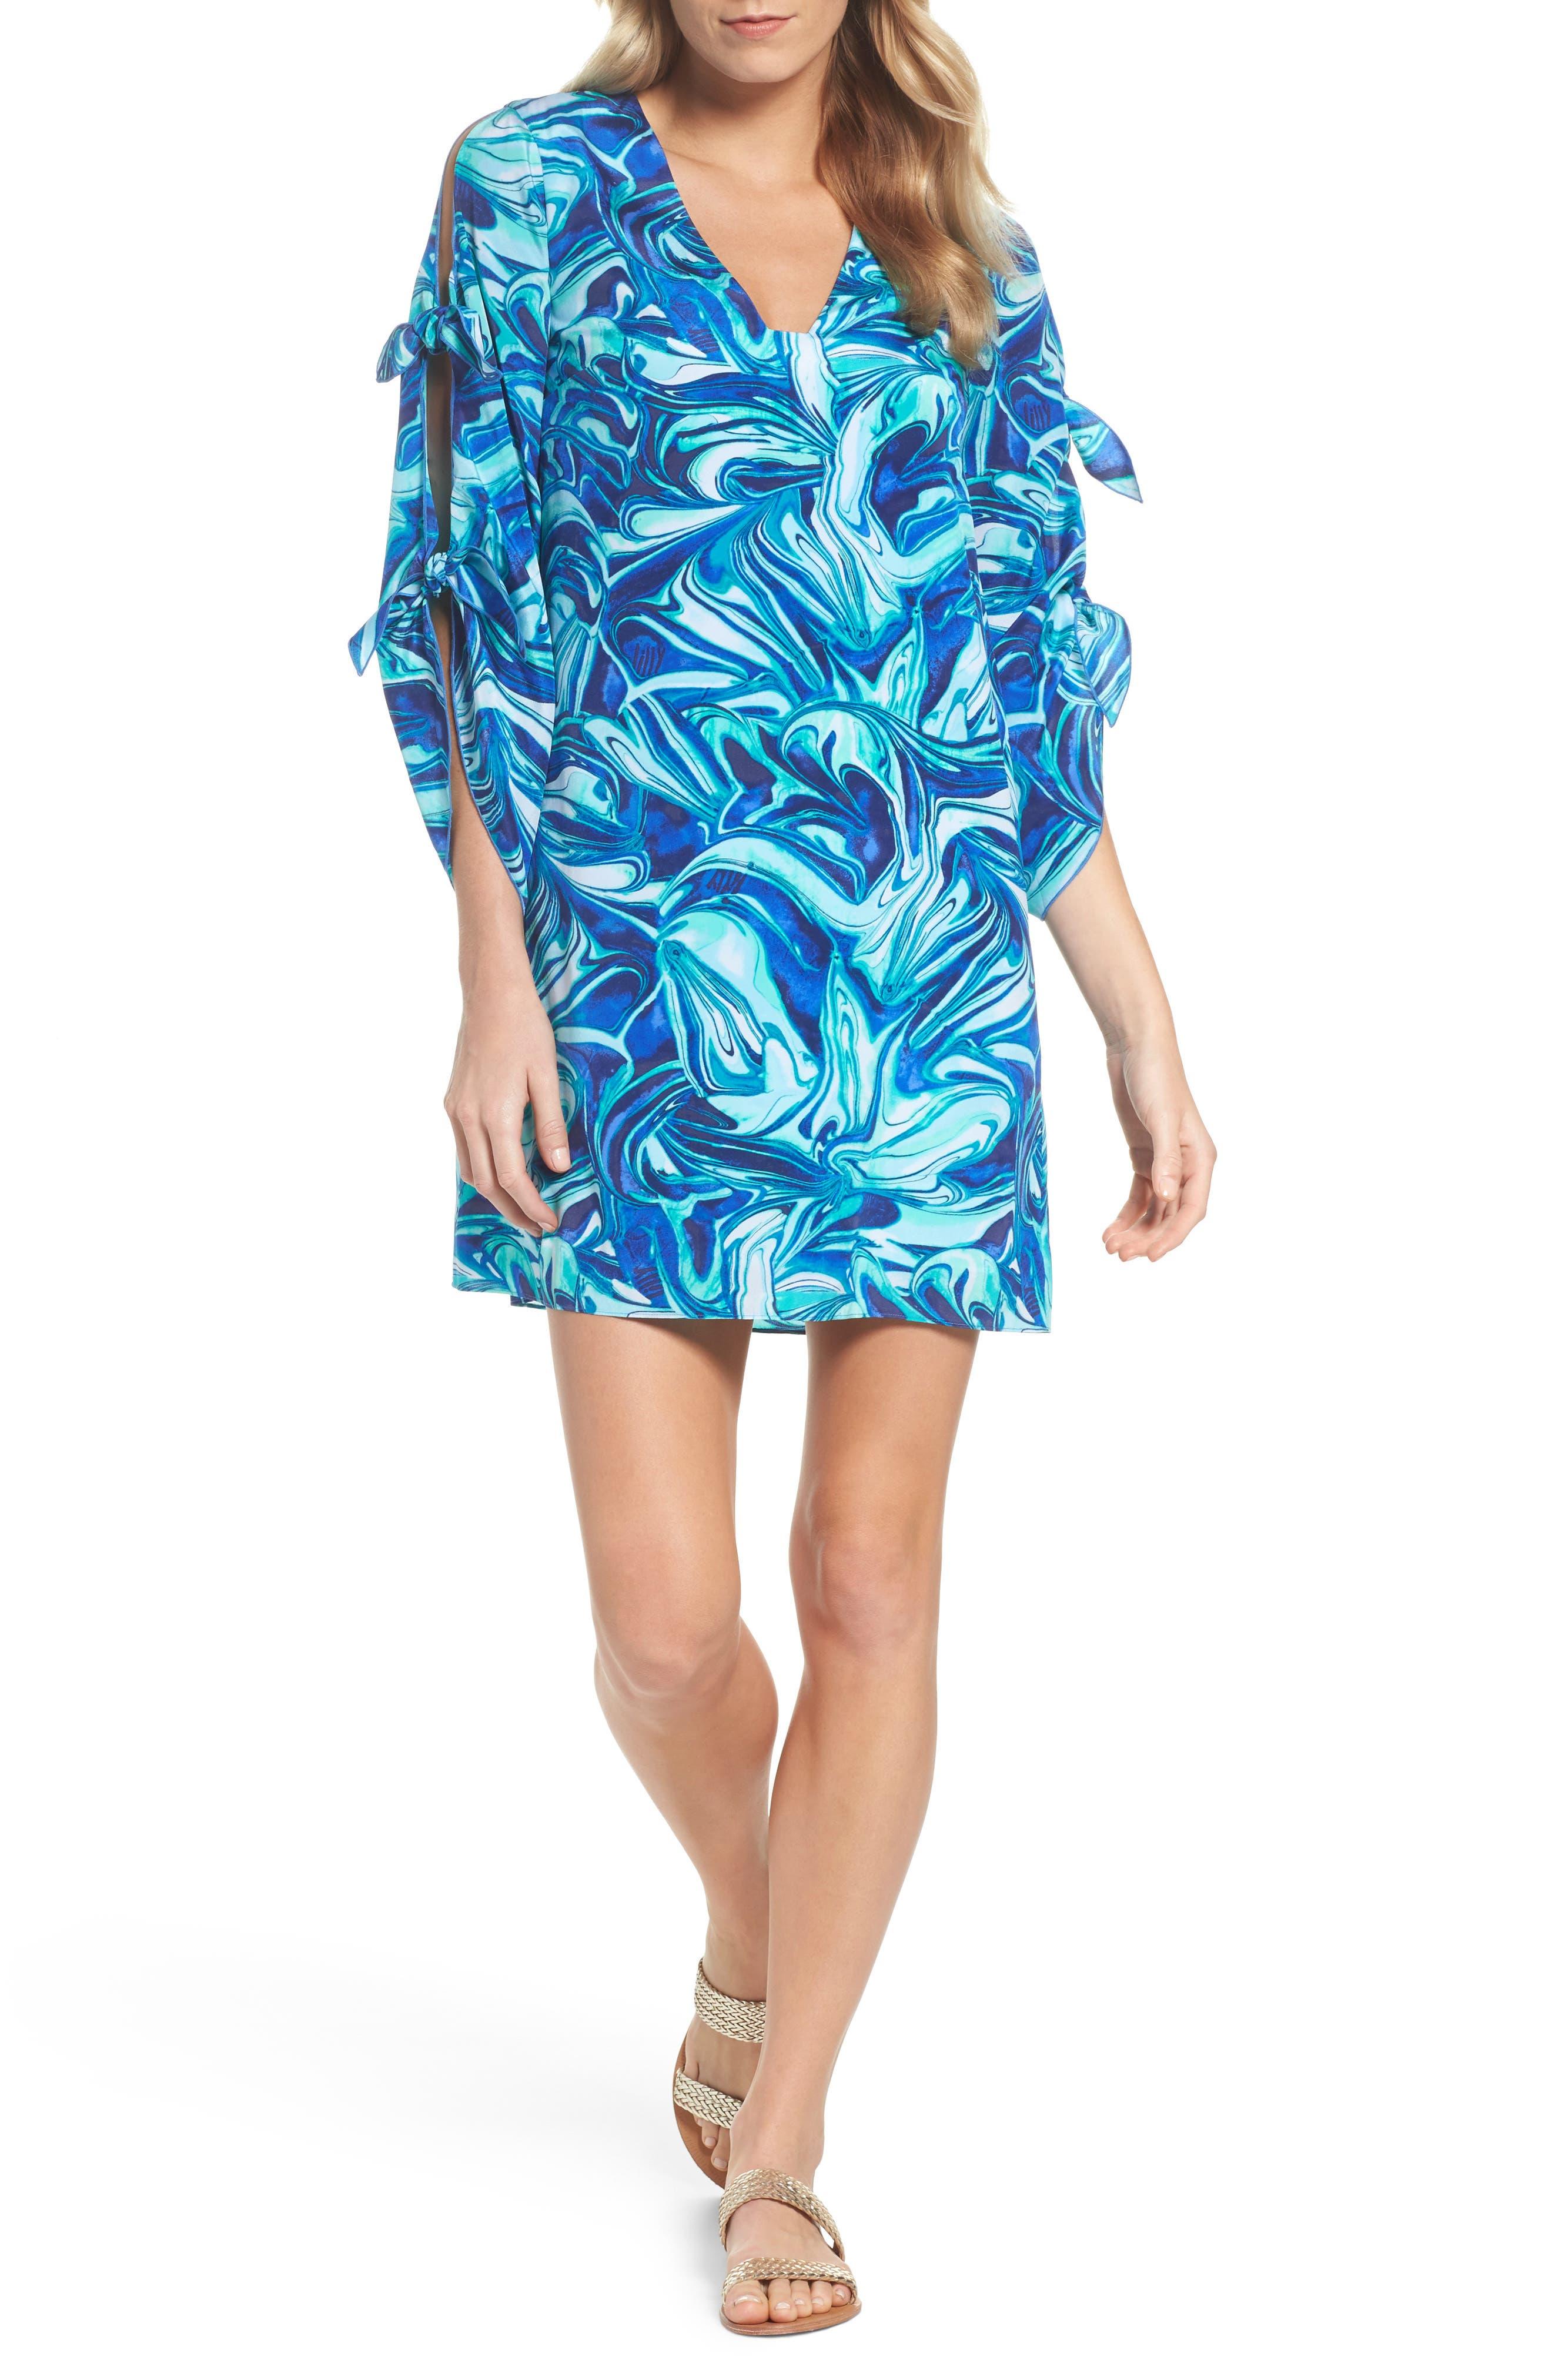 Avila Shift Dress,                         Main,                         color, Ikat Blue Ocean Waves